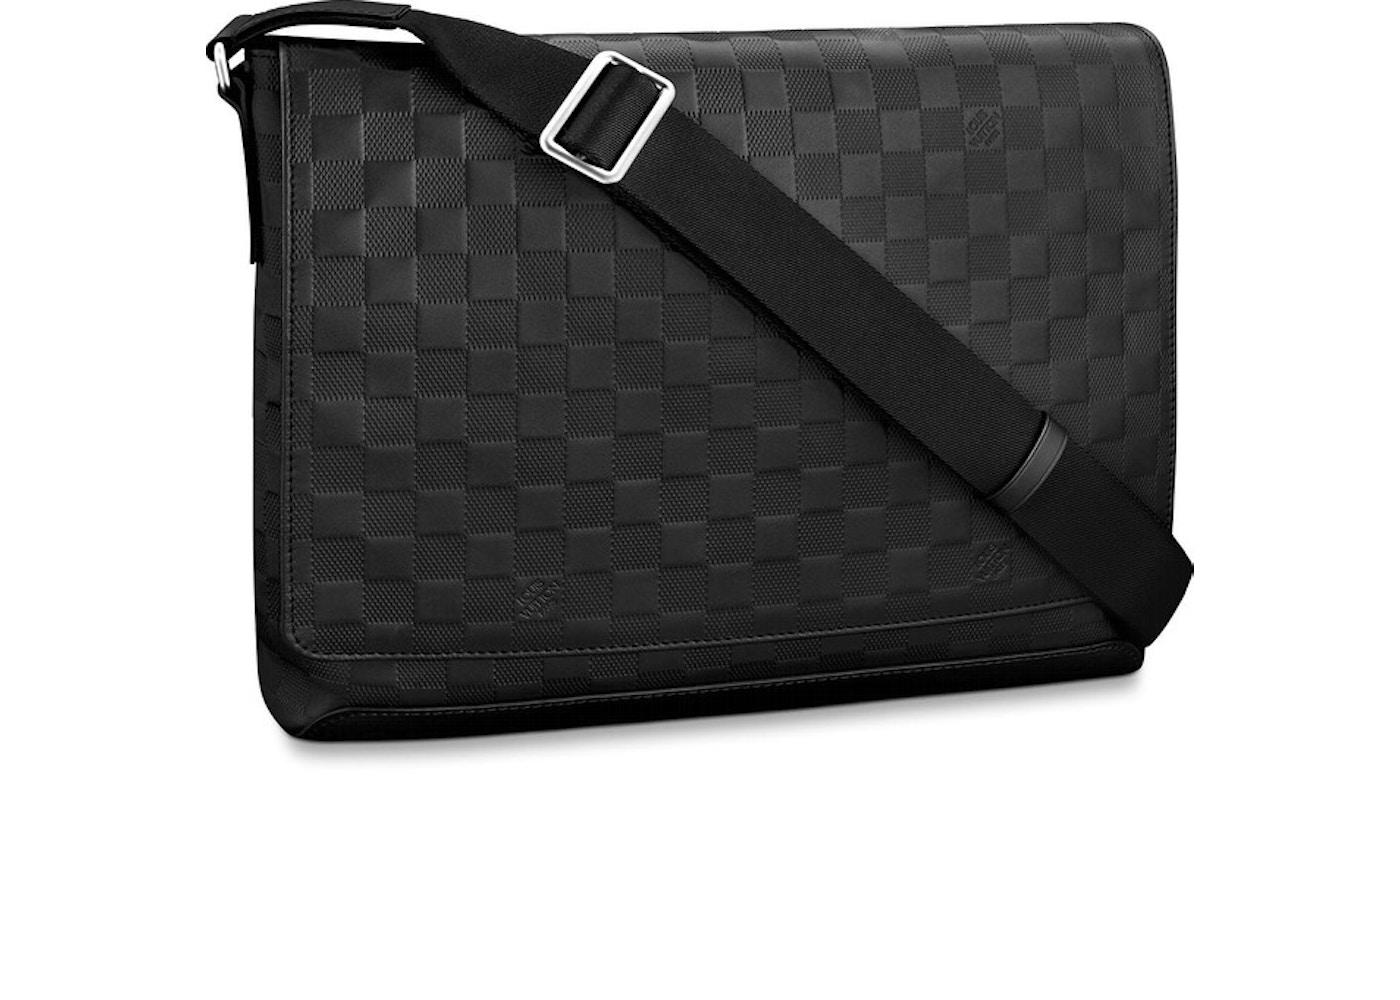 b1c02b7d1 Louis Vuitton District Messenger Bag Damier Infini MM Onyx. Damier Infini MM  Onyx